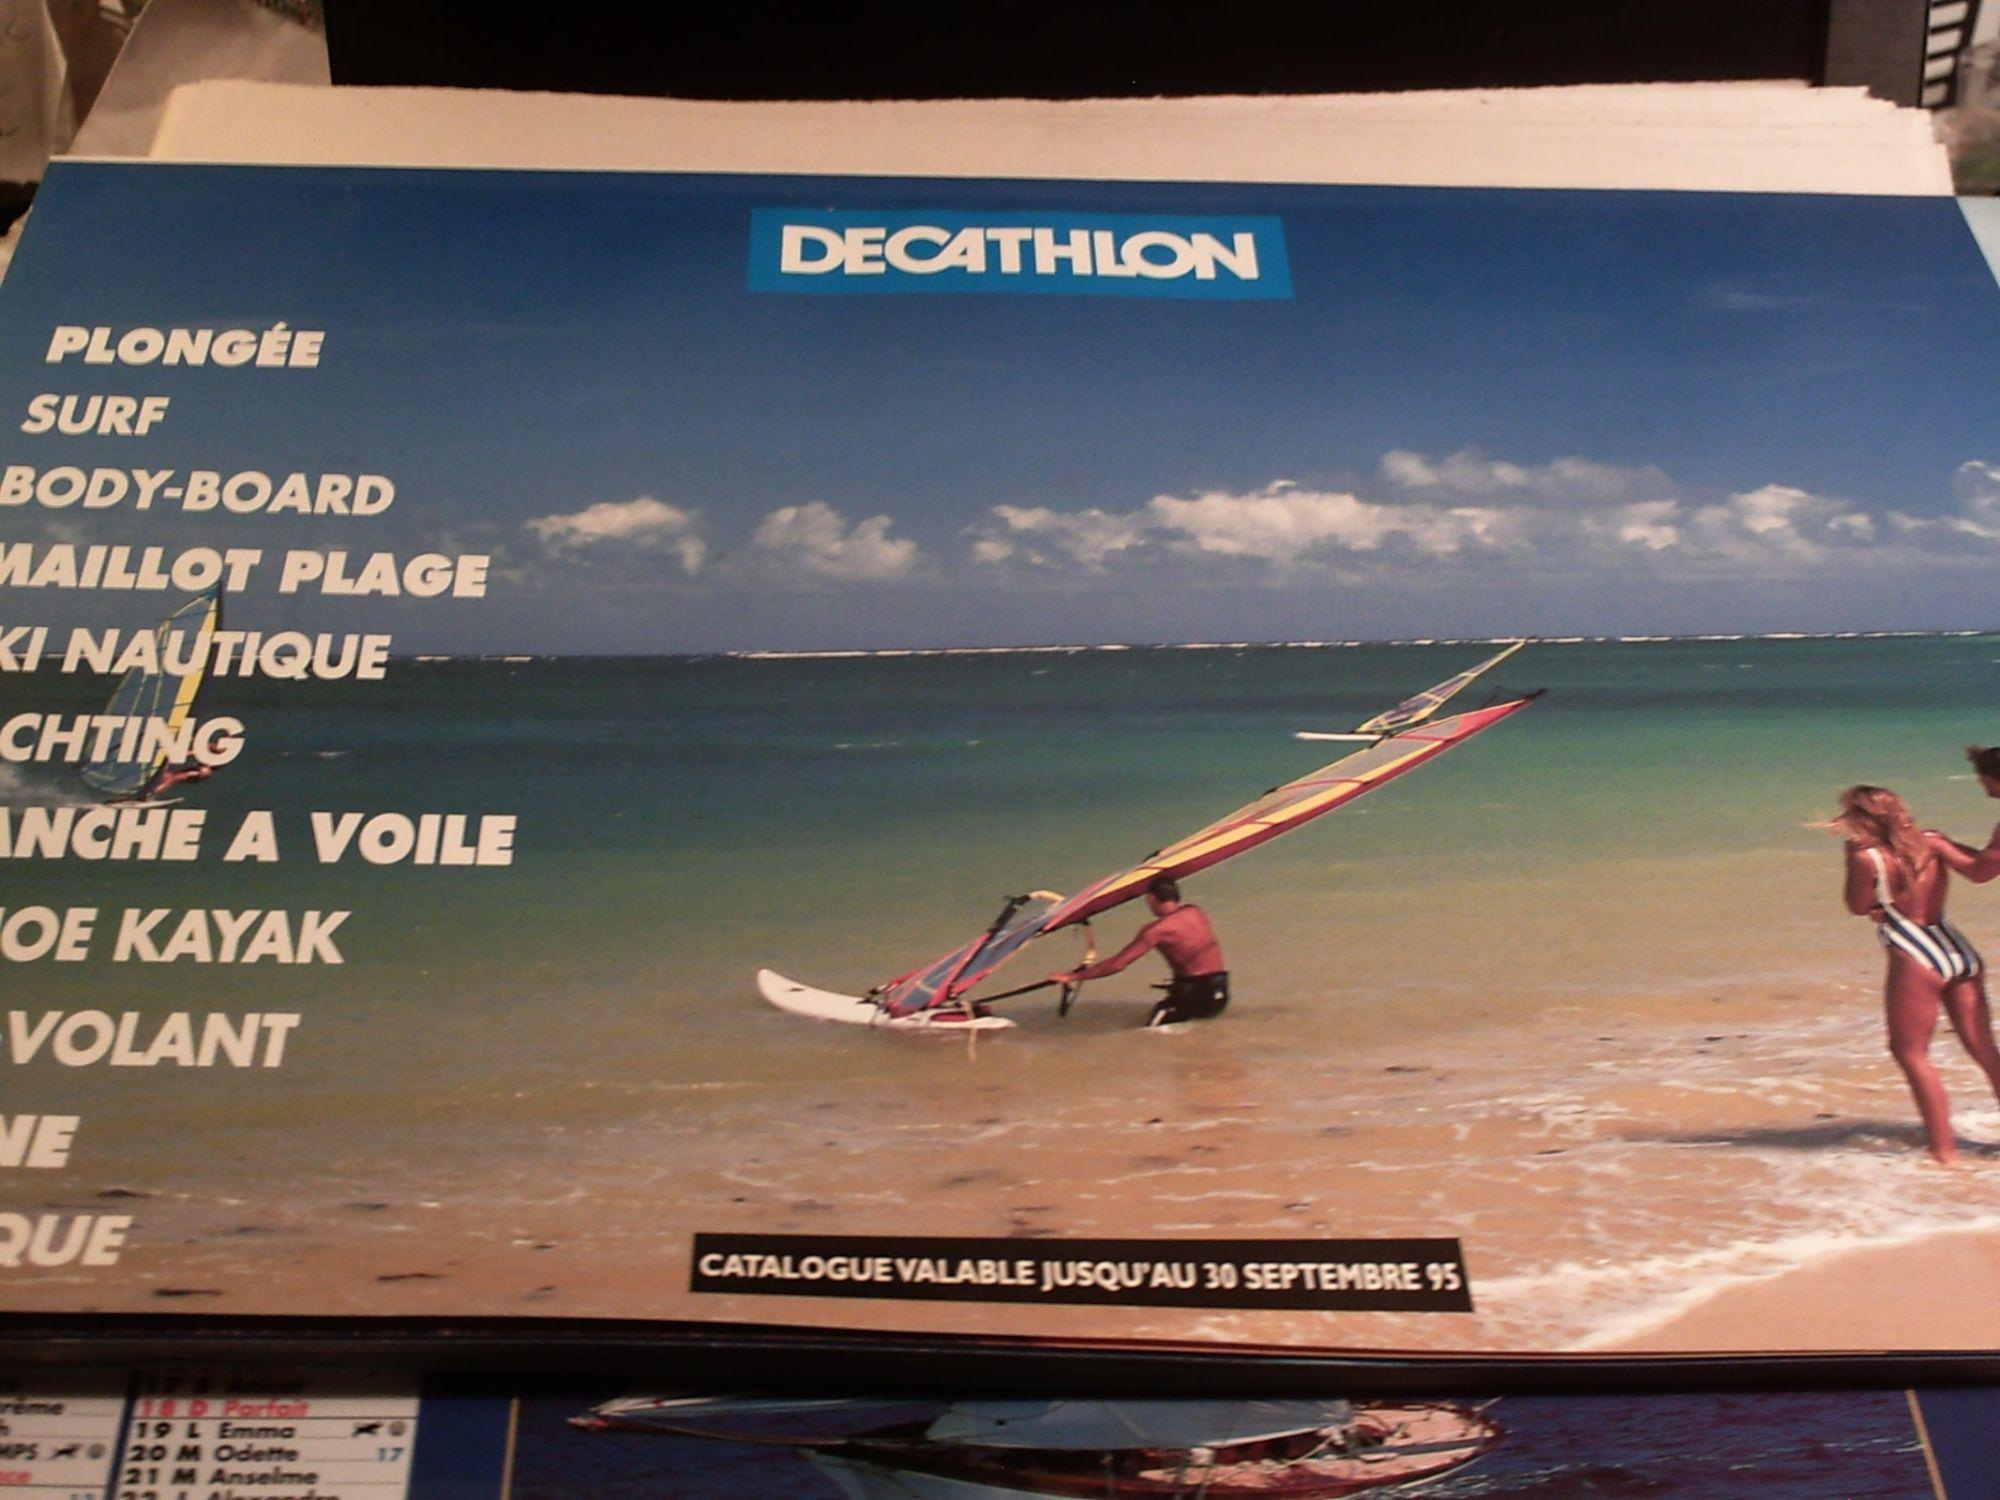 Catalogue Decathlon Plongee Surf Body Board Maillot Plage Ski Nautique Yachting Planche A Voile Canoe Kayak Cerf Volant Piscine Petanque 1995 Rakuten